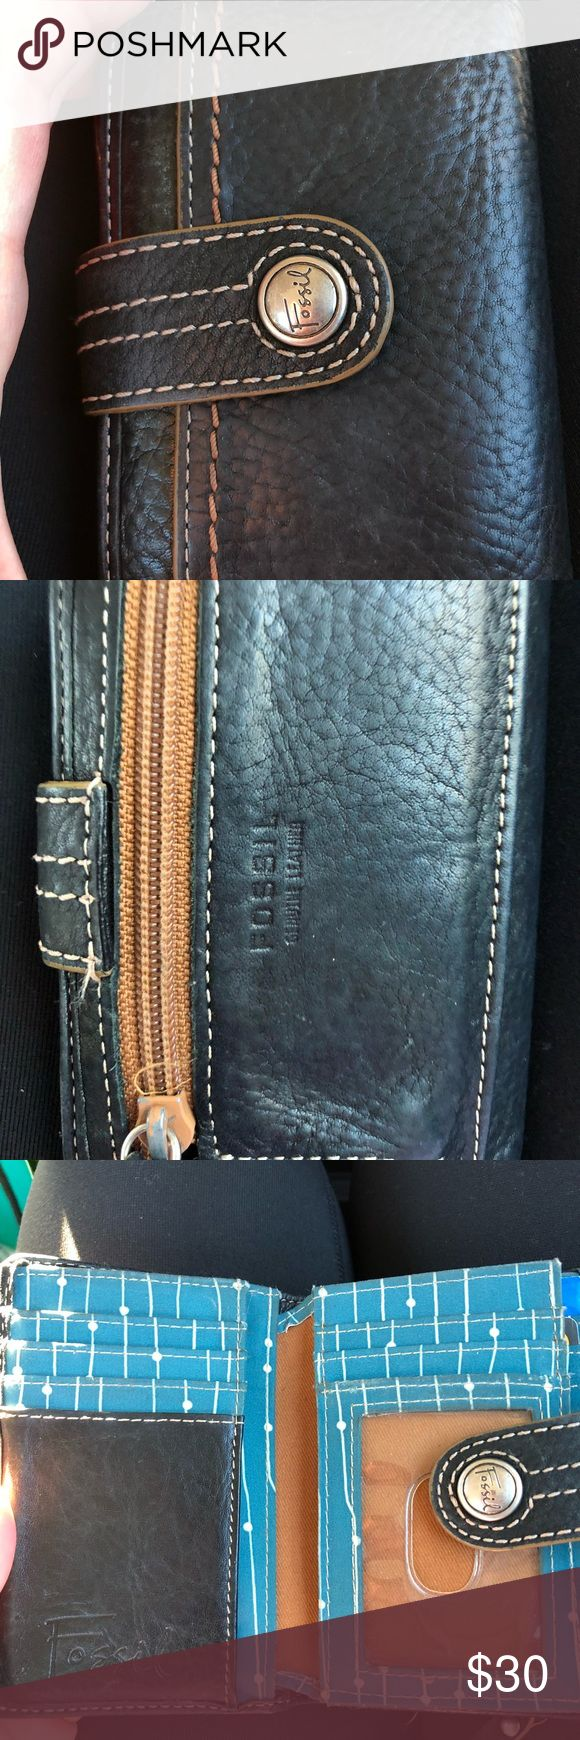 Fossil wallet Fossil wallet Fossil Bags Wallets